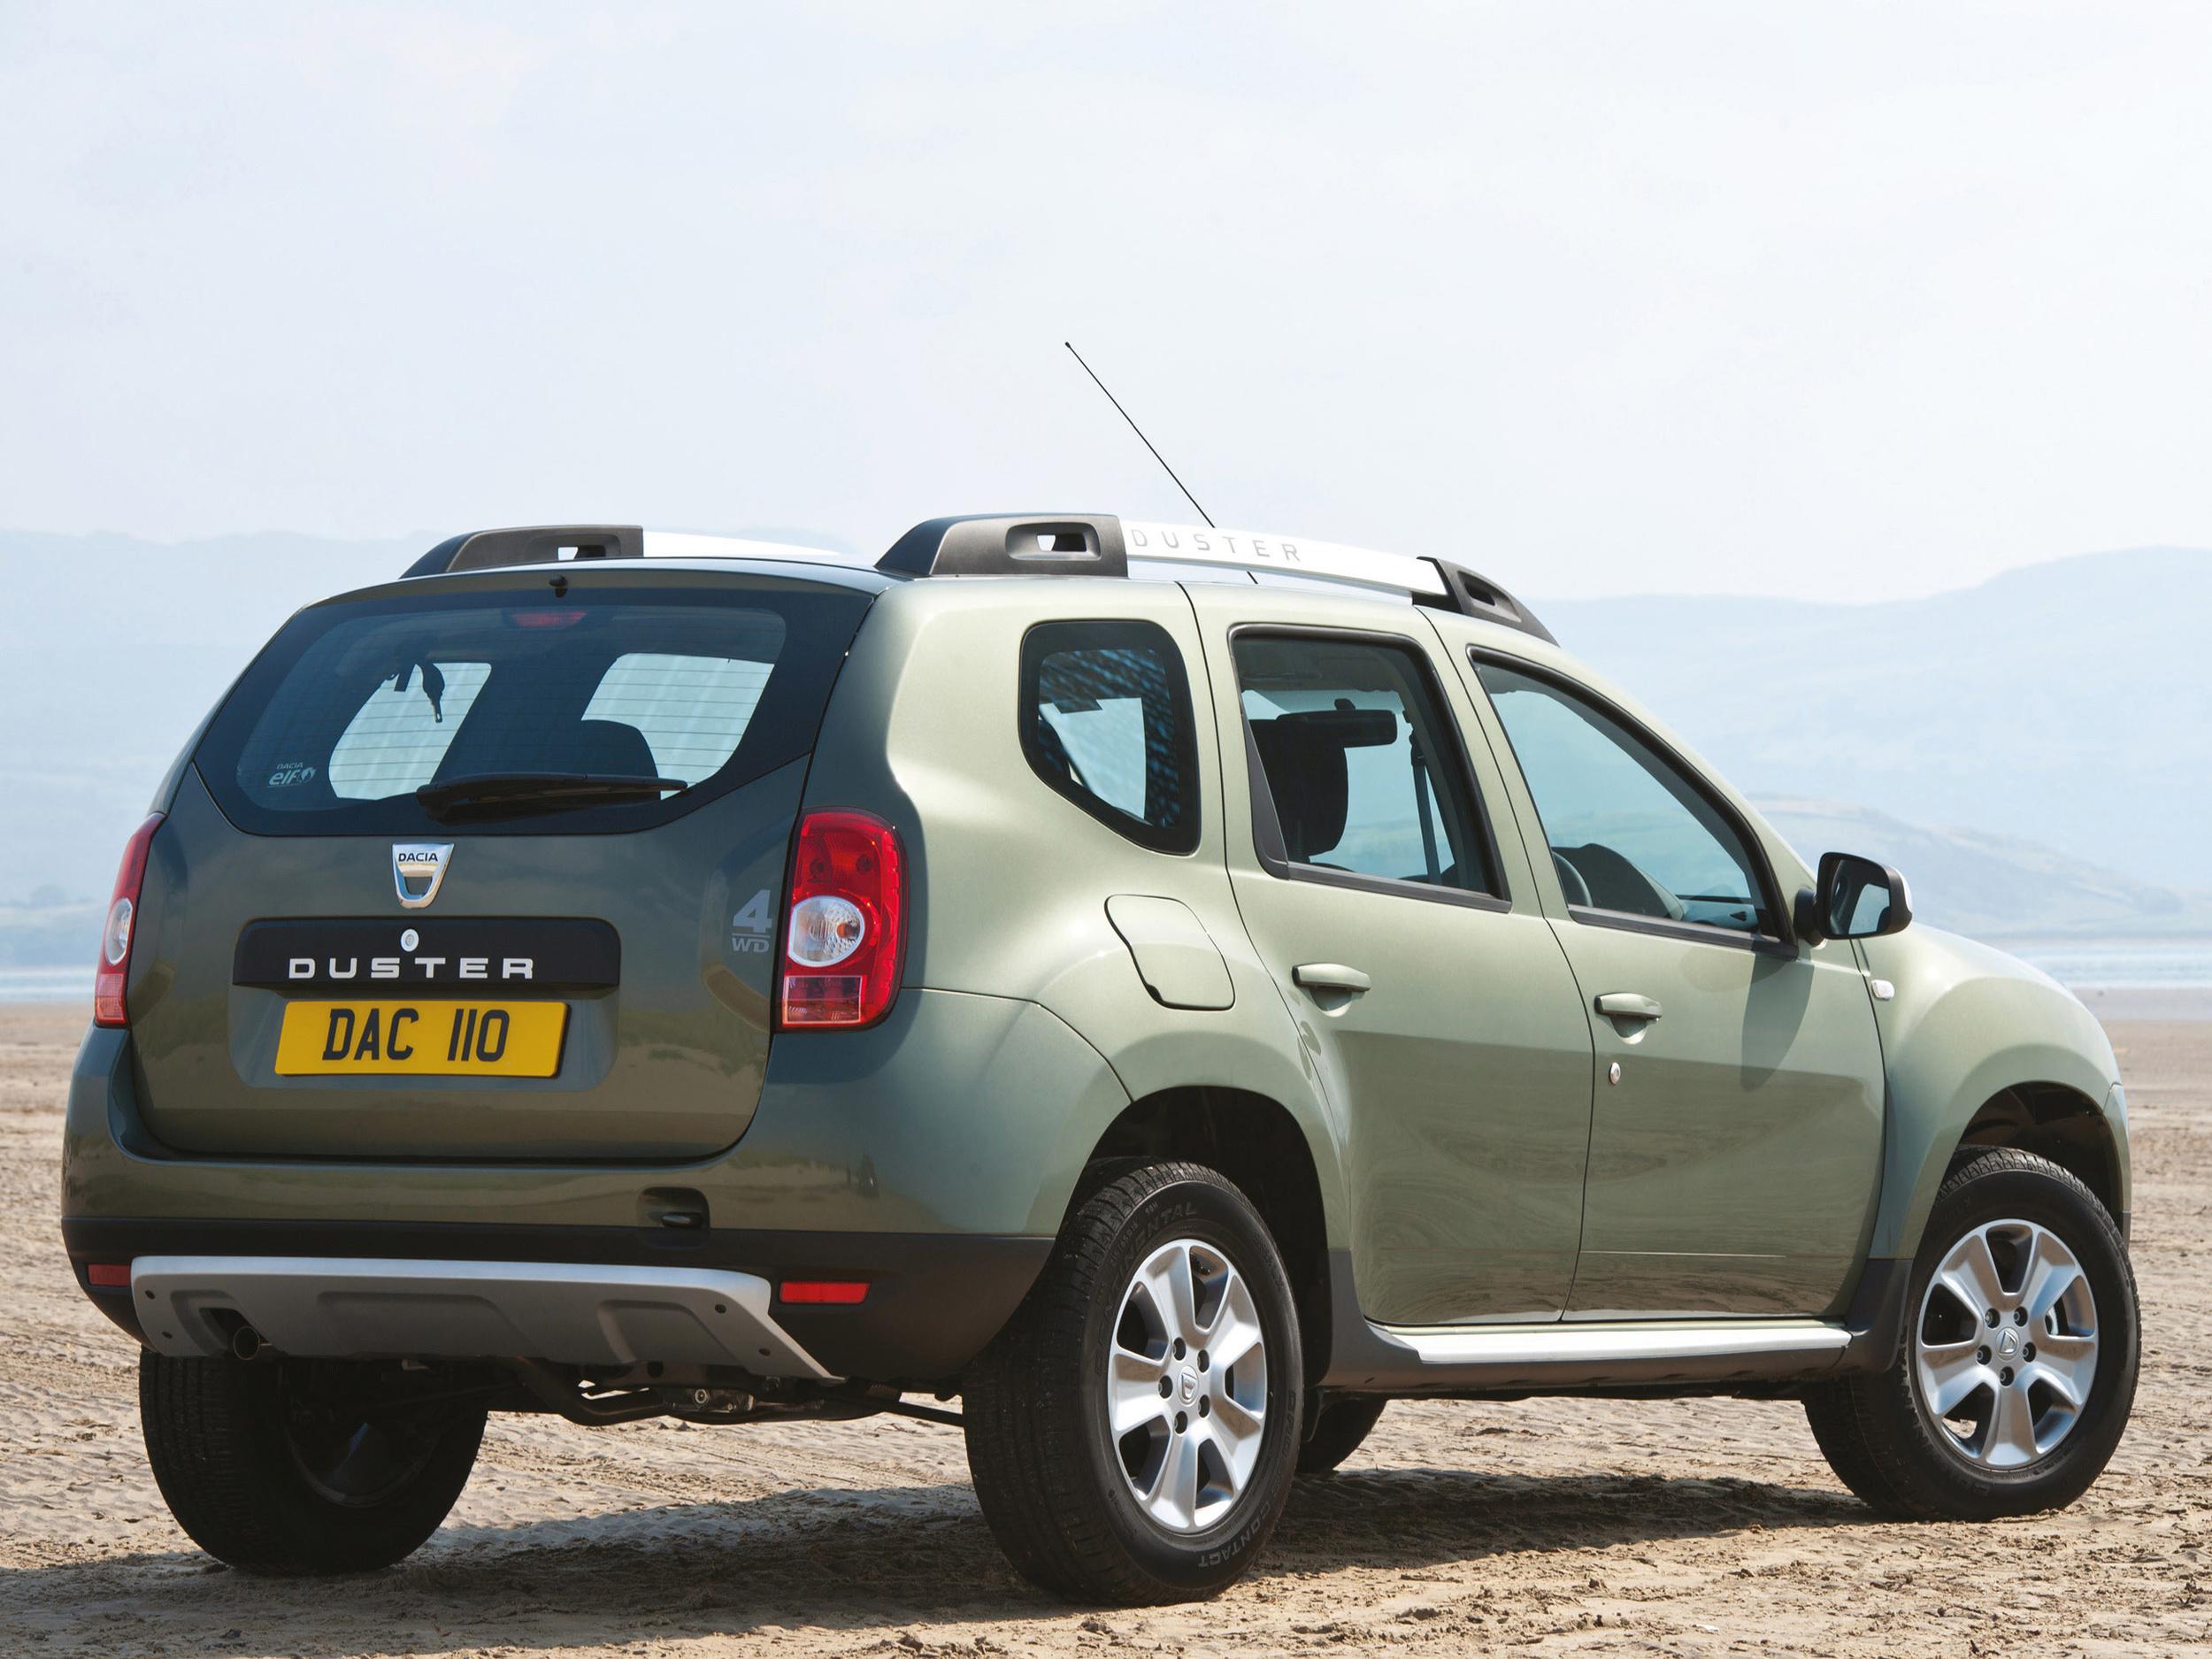 EU6 engines improve economy and emissions across Dacia Duster range